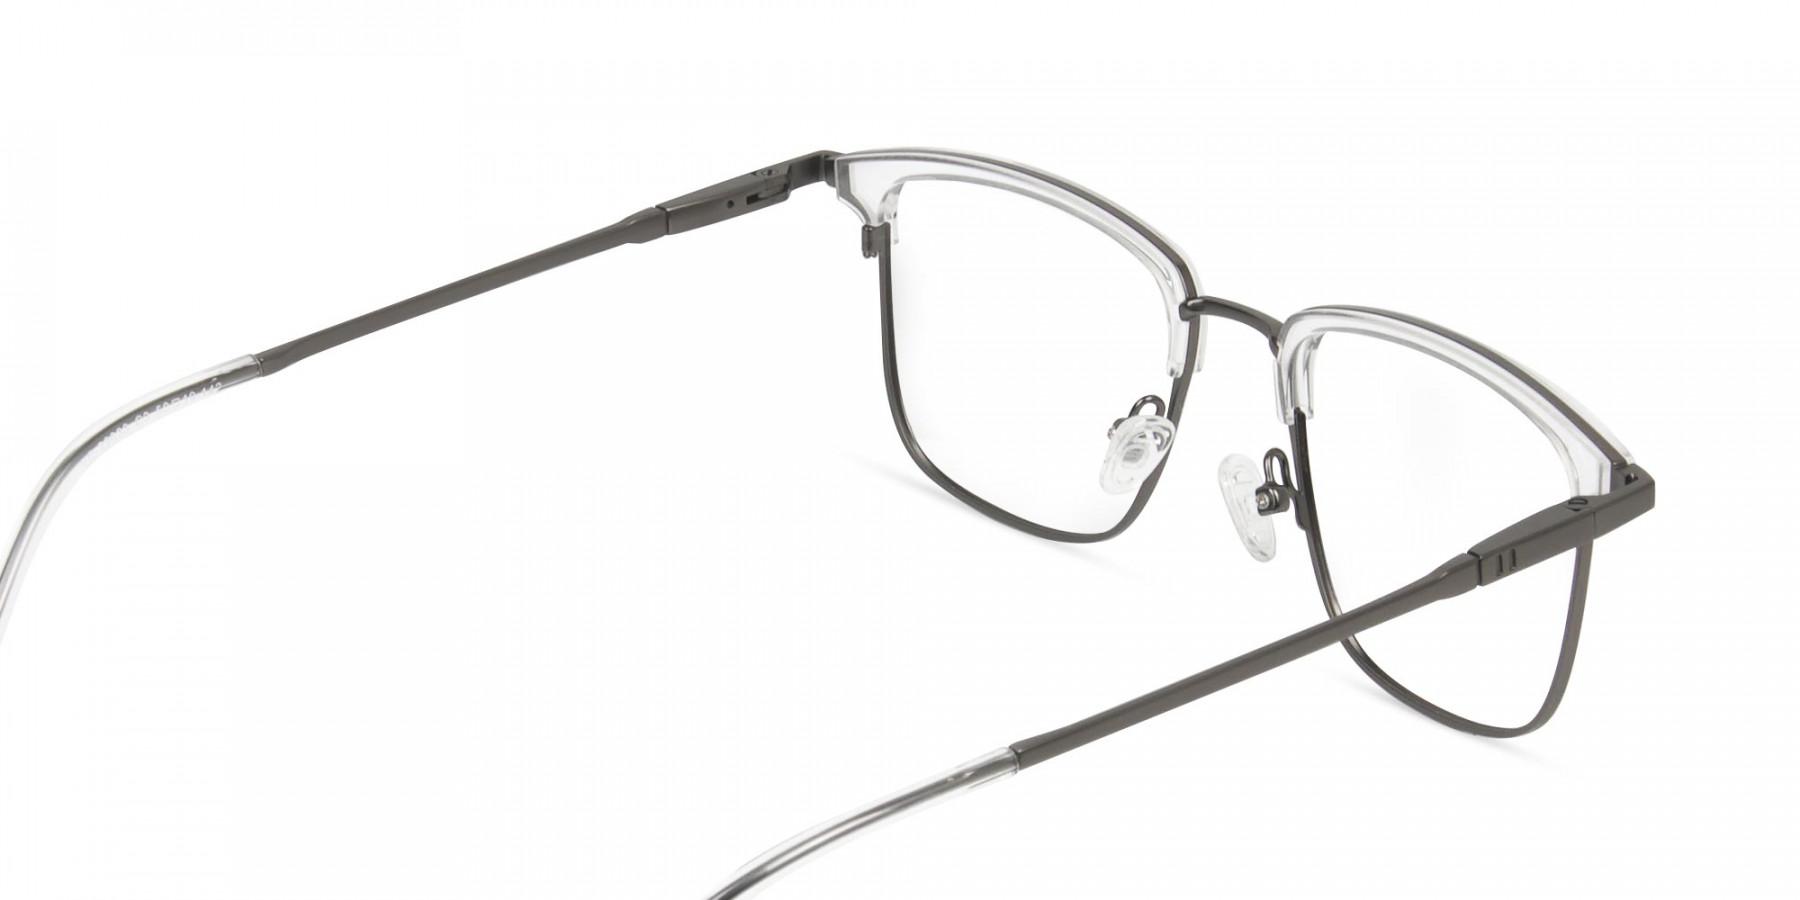 Transparent and Gunmetal Frames in Metal - 1